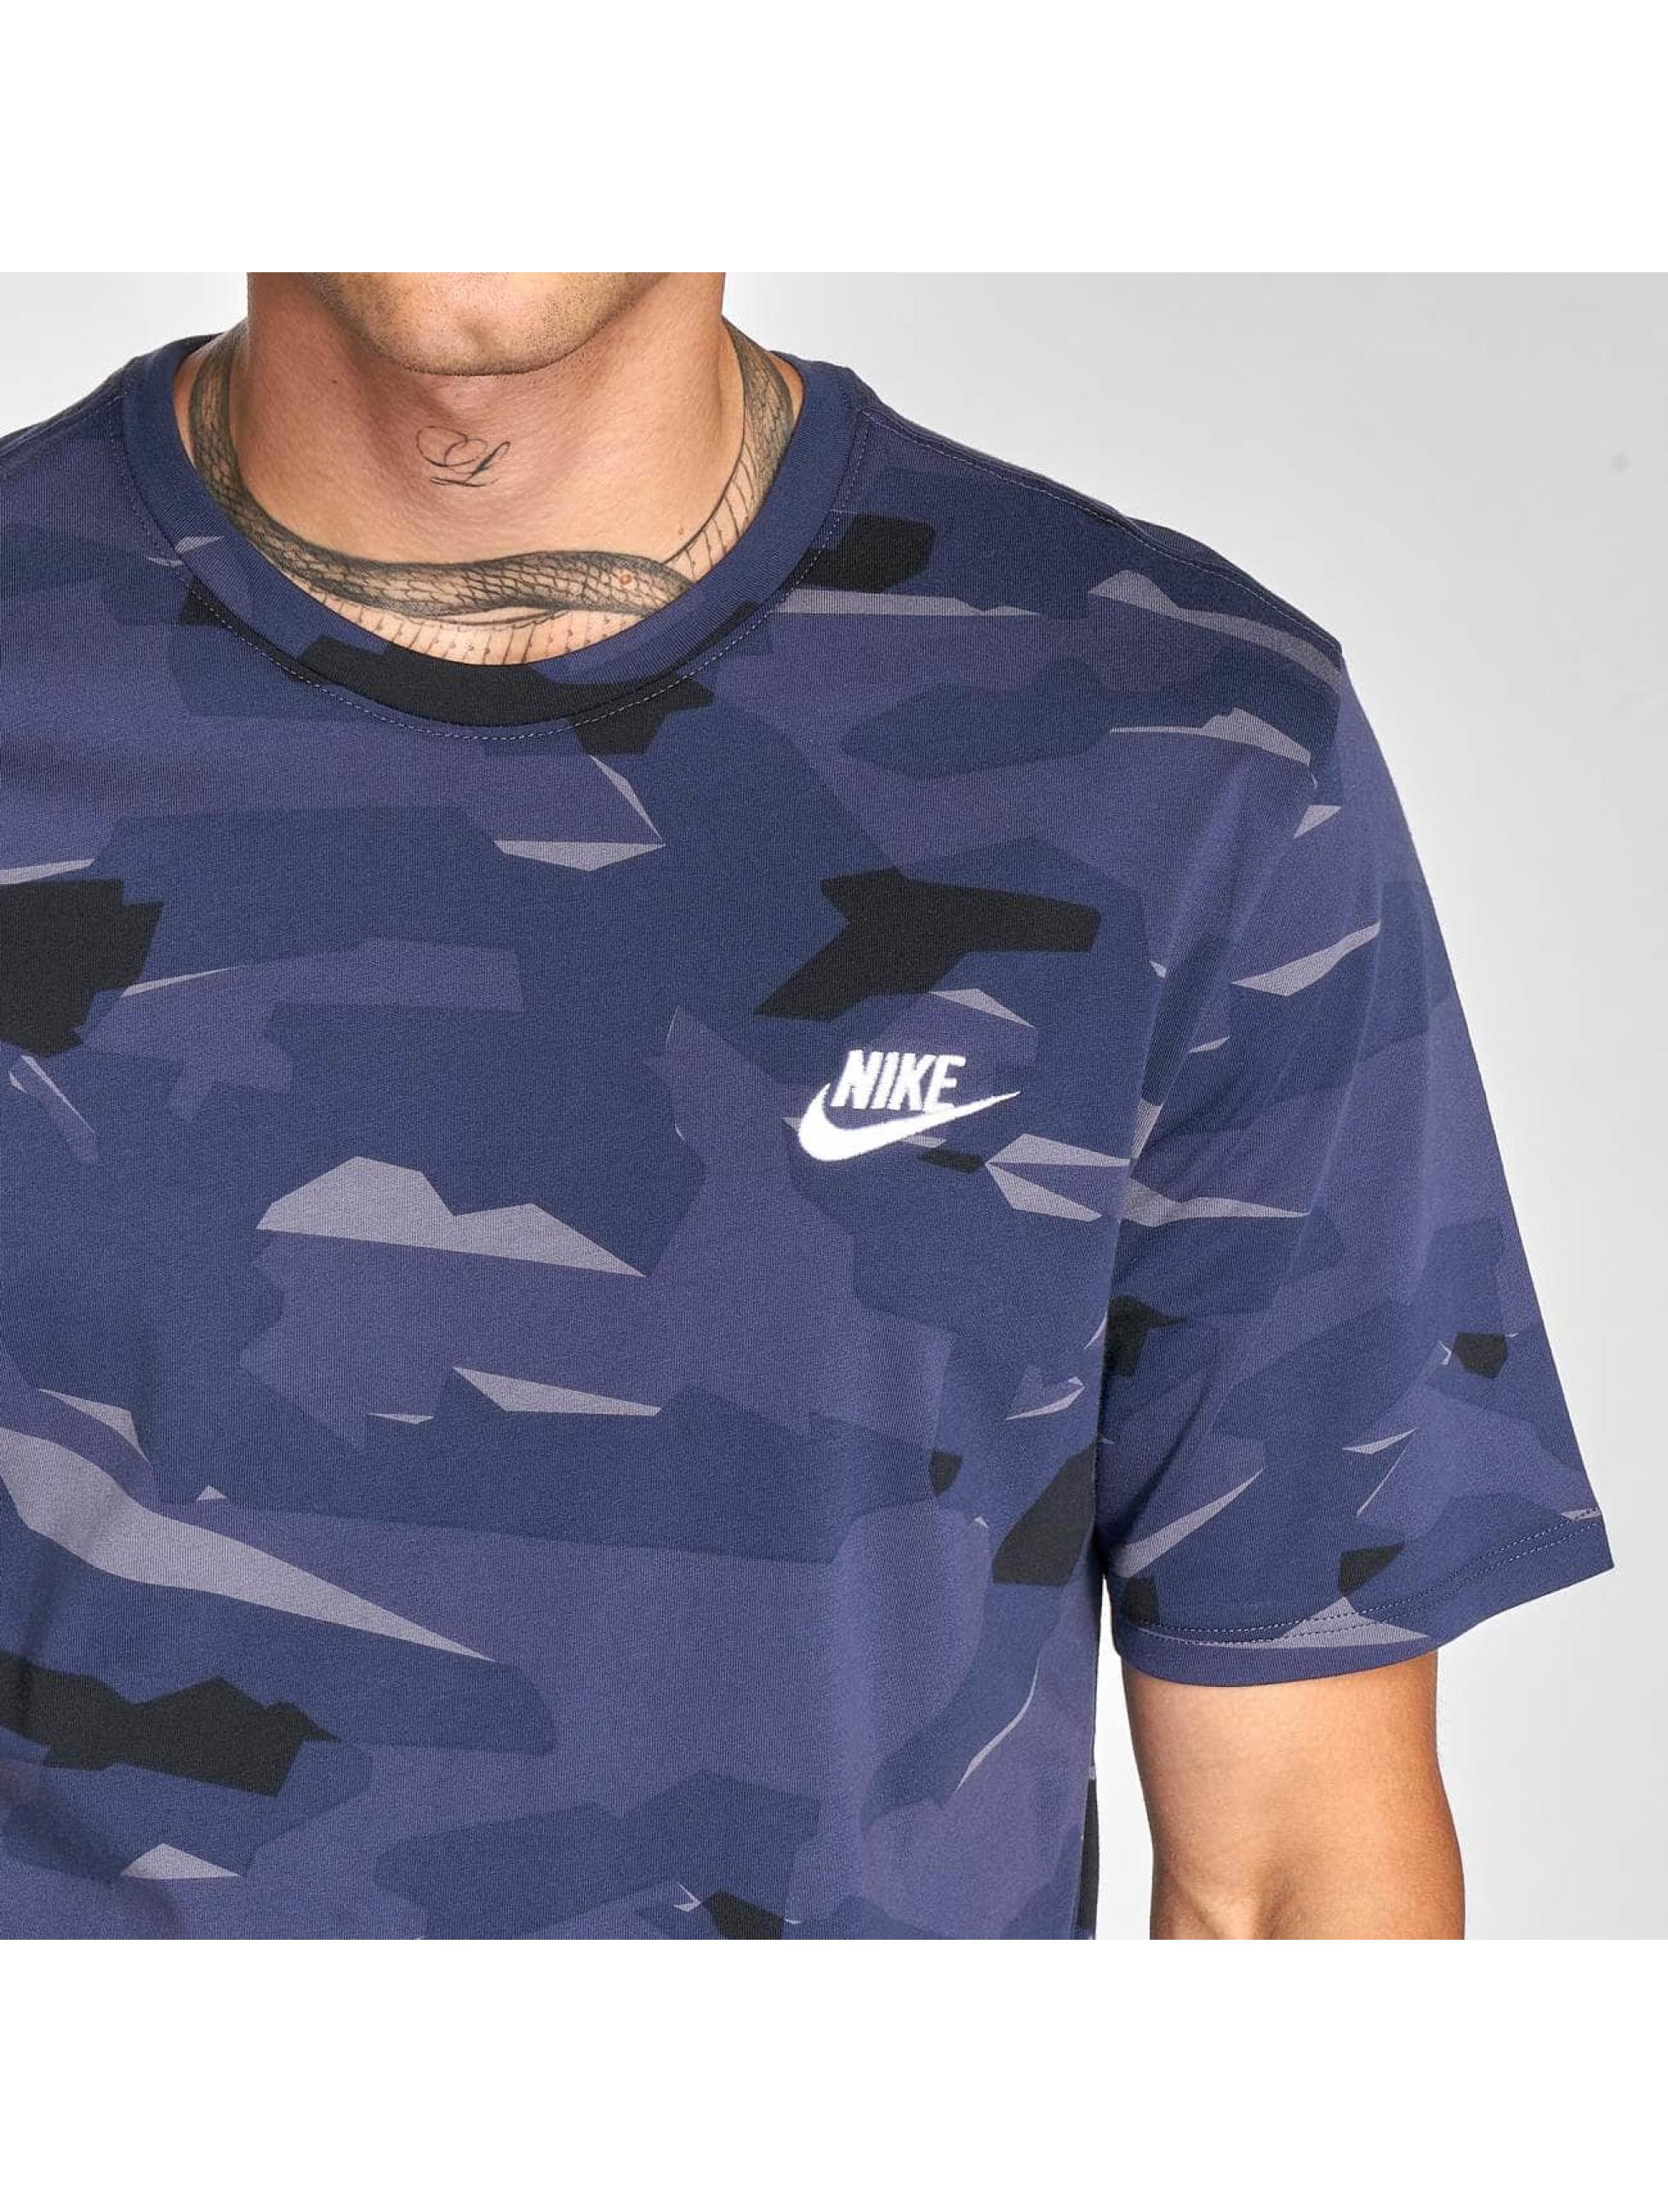 new concept e8937 37fe2 Nike T-paidat Pack 1 Camo sininen